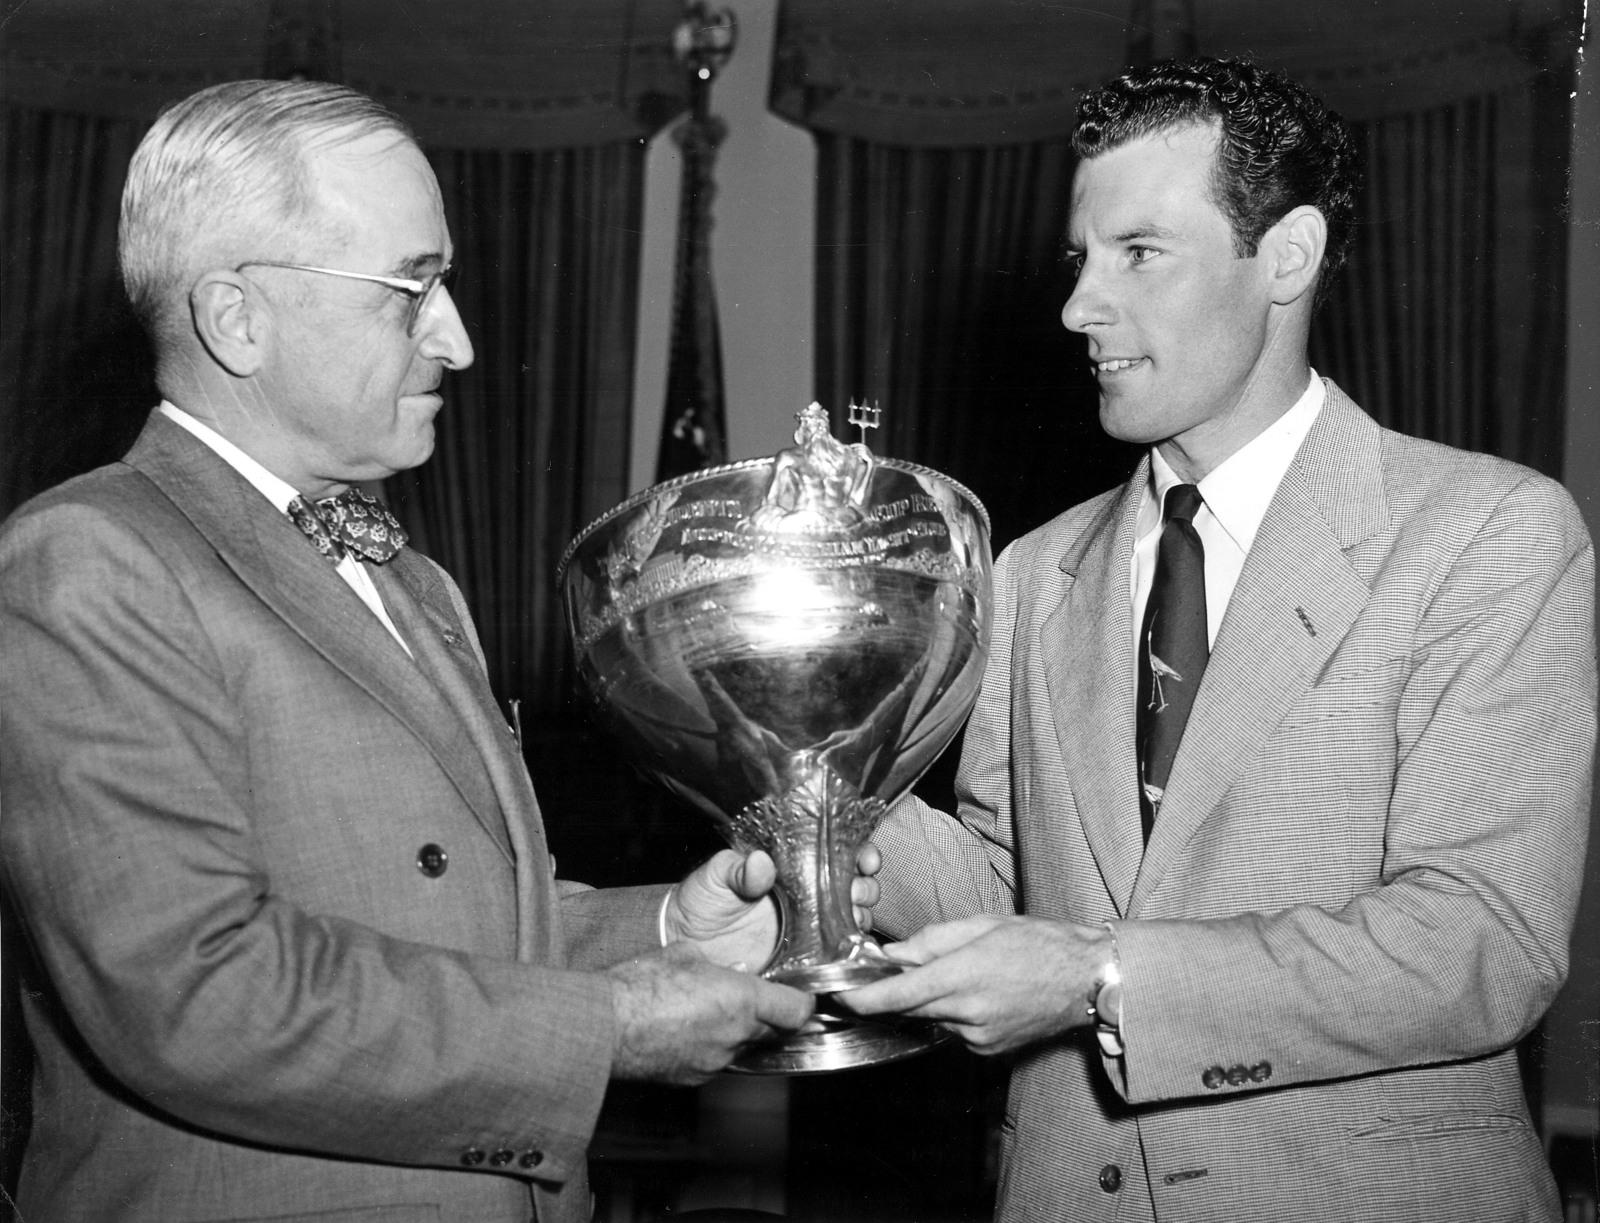 President Harry S. Truman Presents a Trophy